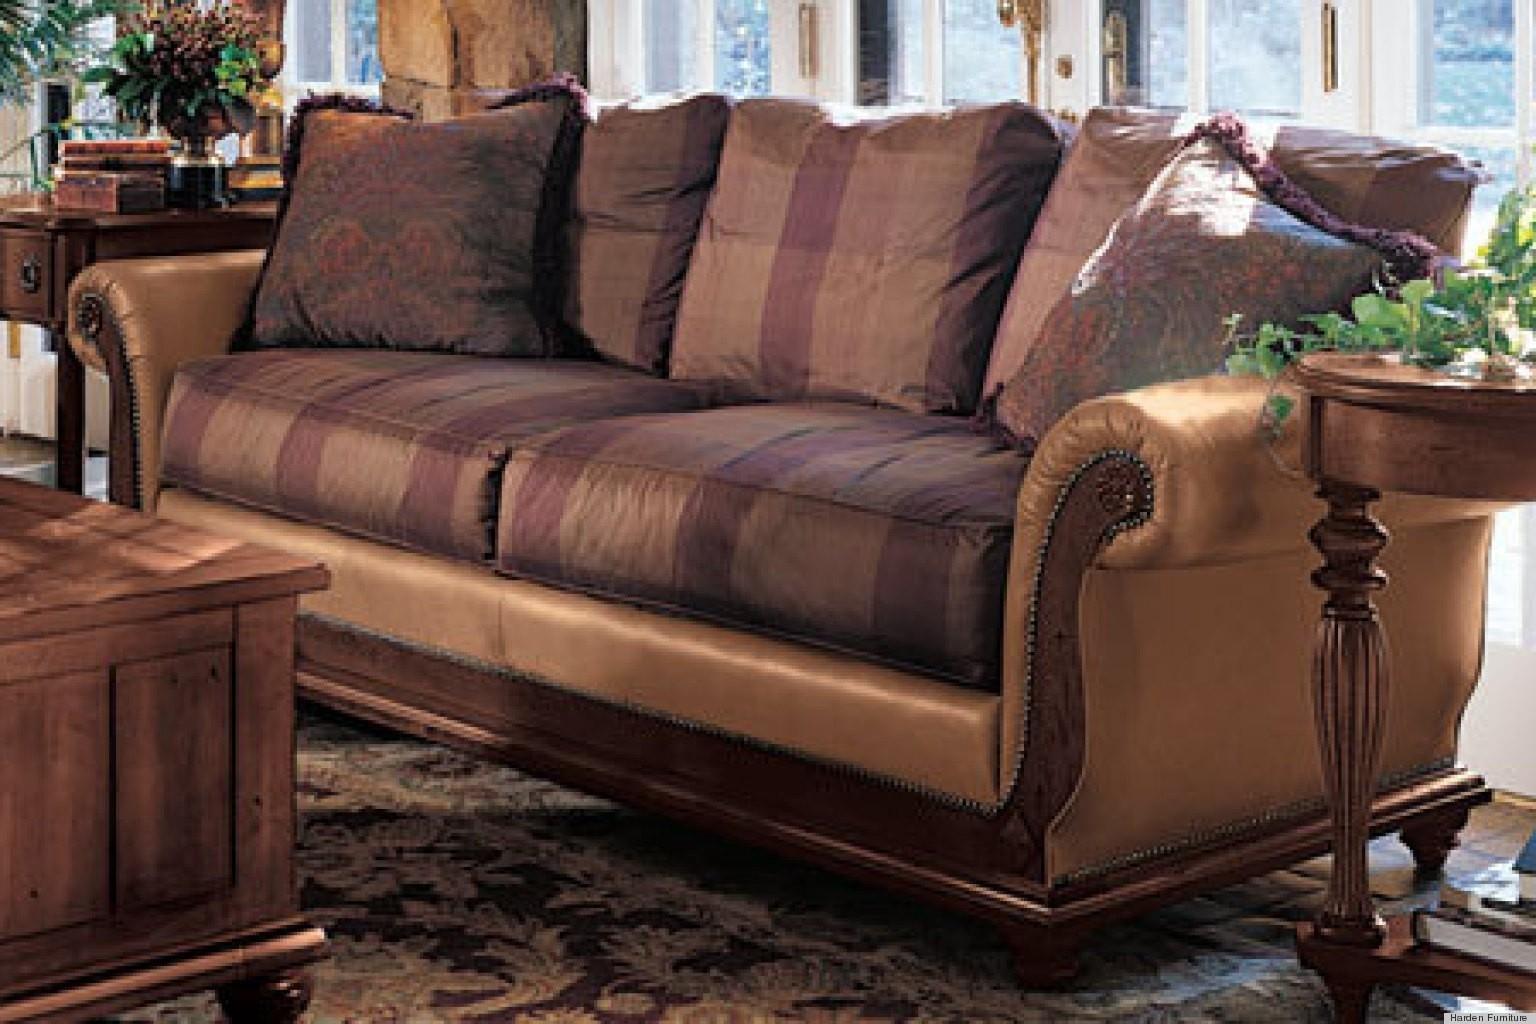 Fresh Sectional Sofa Craigslist - Buildsimplehome throughout Sectional Sofas At Craigslist (Image 6 of 15)